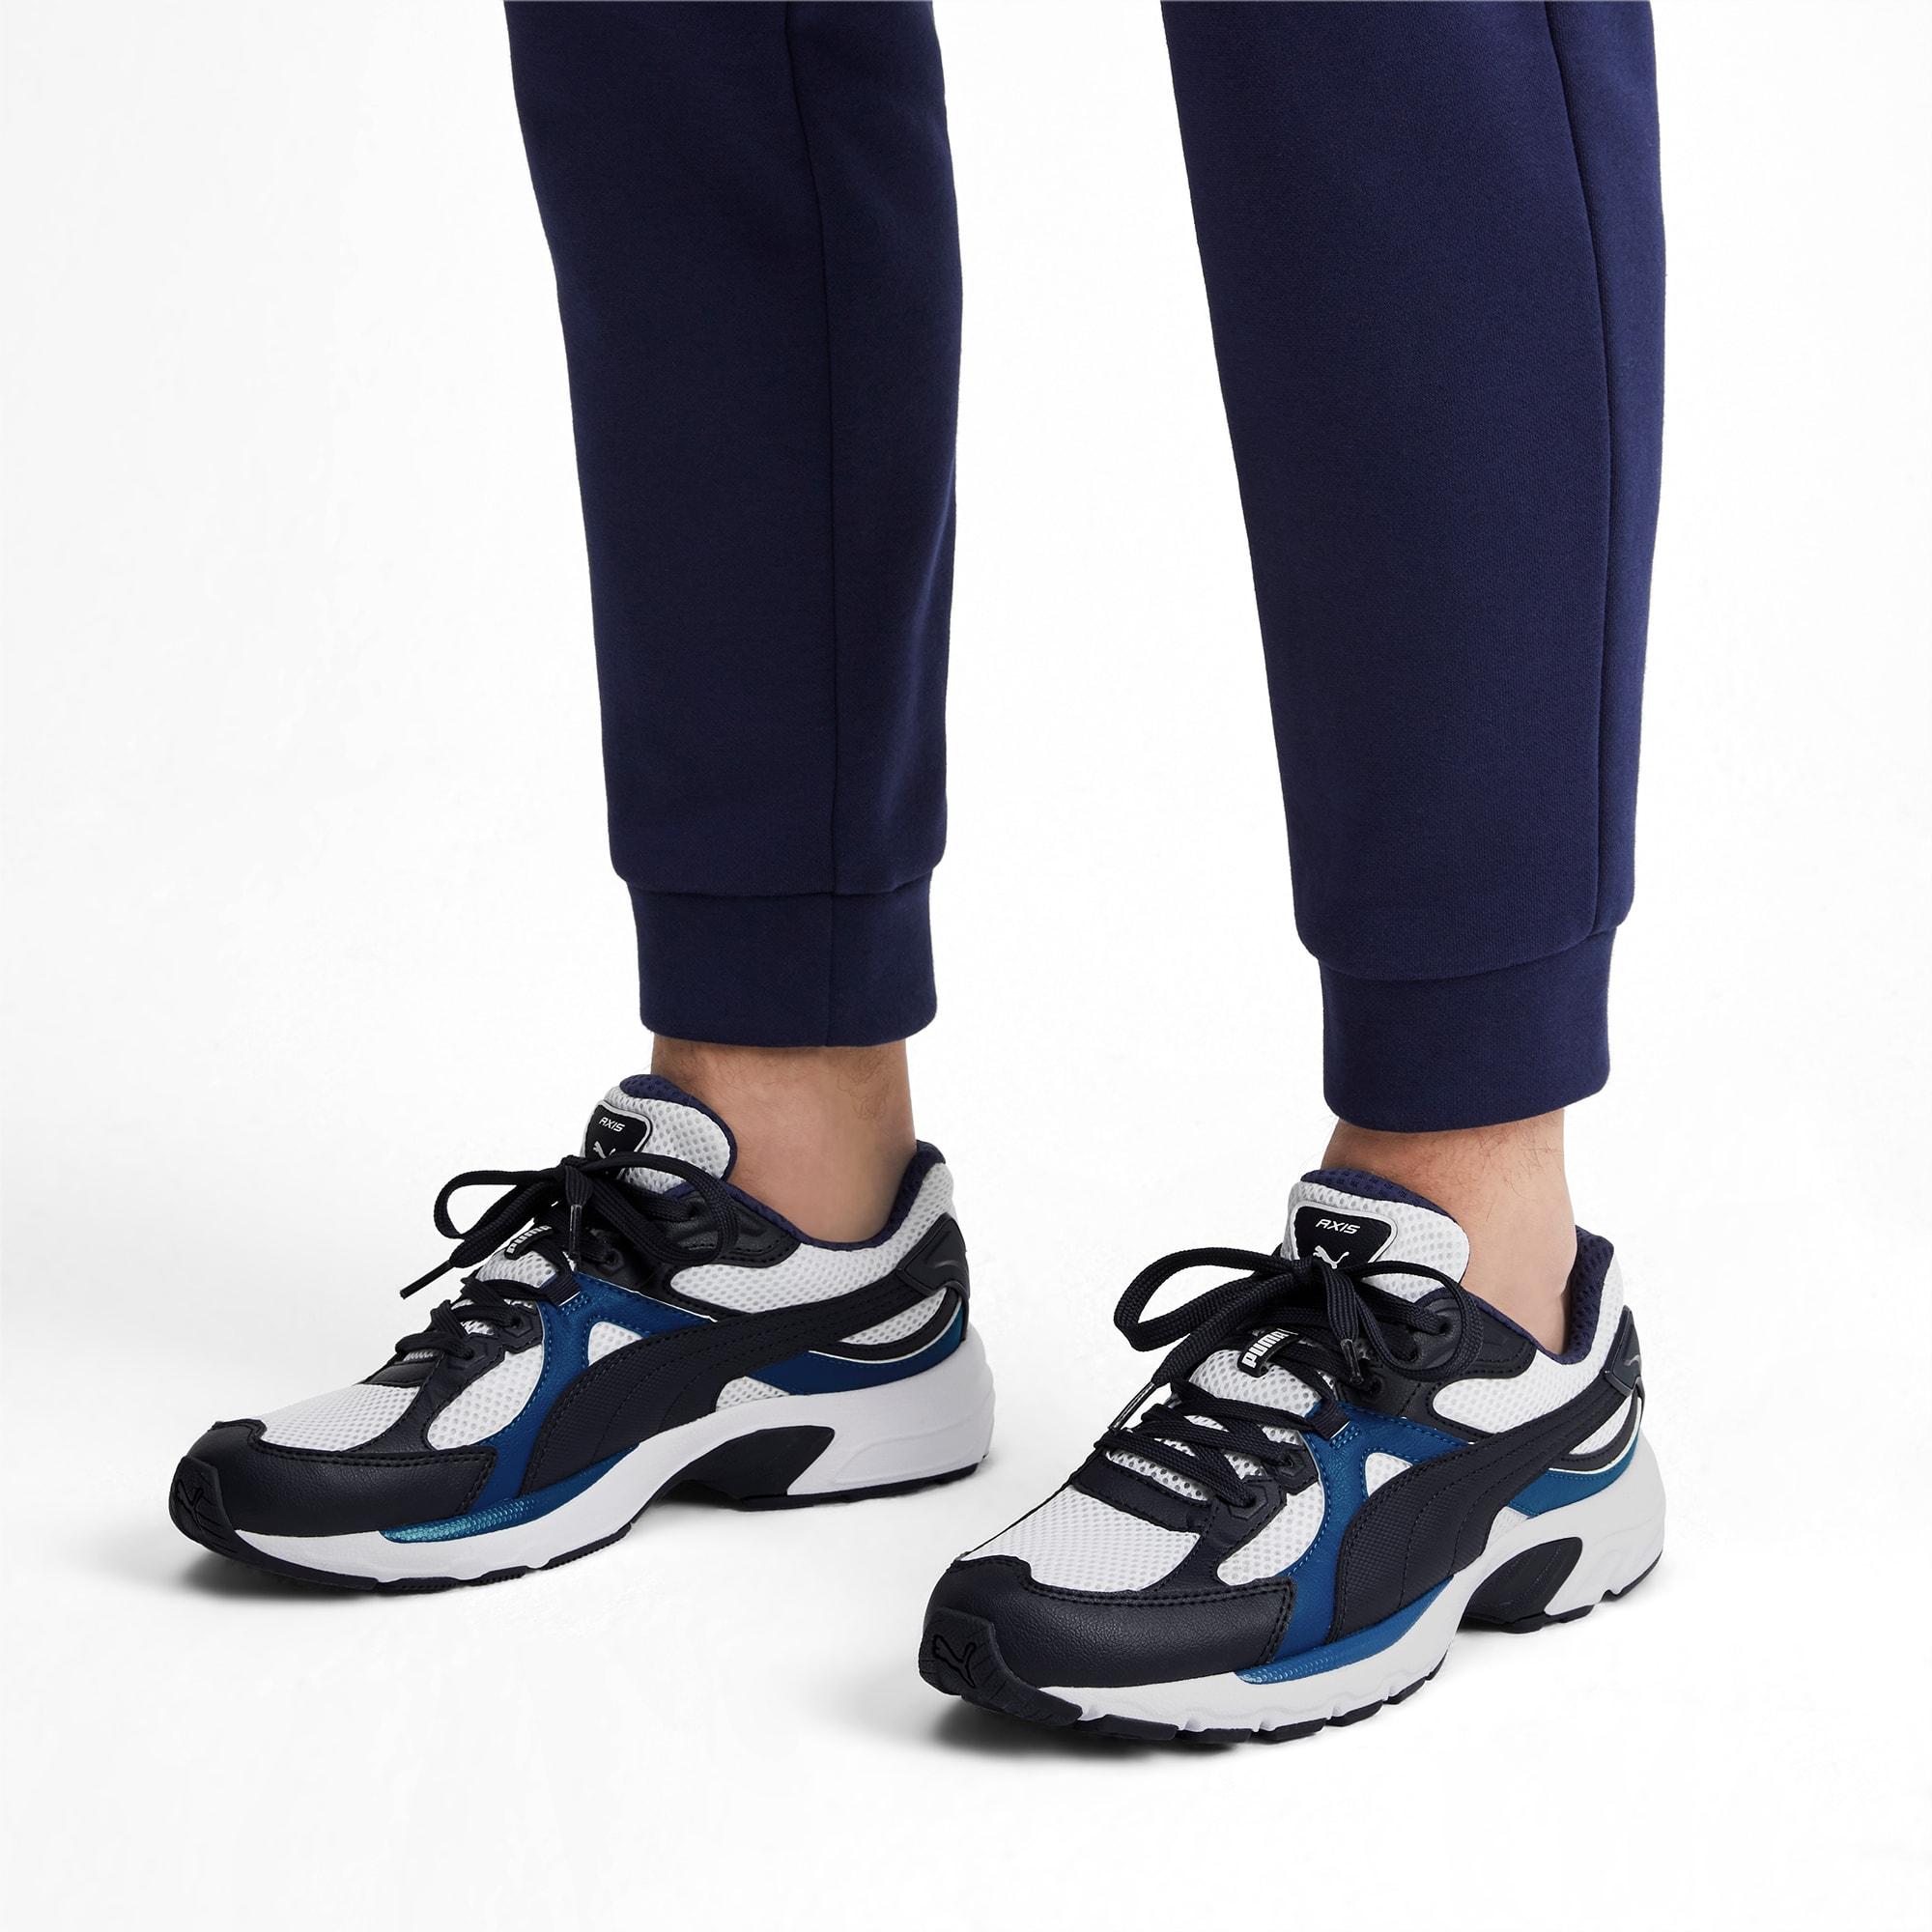 grosor alarma Entender mal  Axis Plus 90s SoftFoam+ Sneakers | White-Peacoat-Galaxy Blue | PUMA Shoes |  PUMA